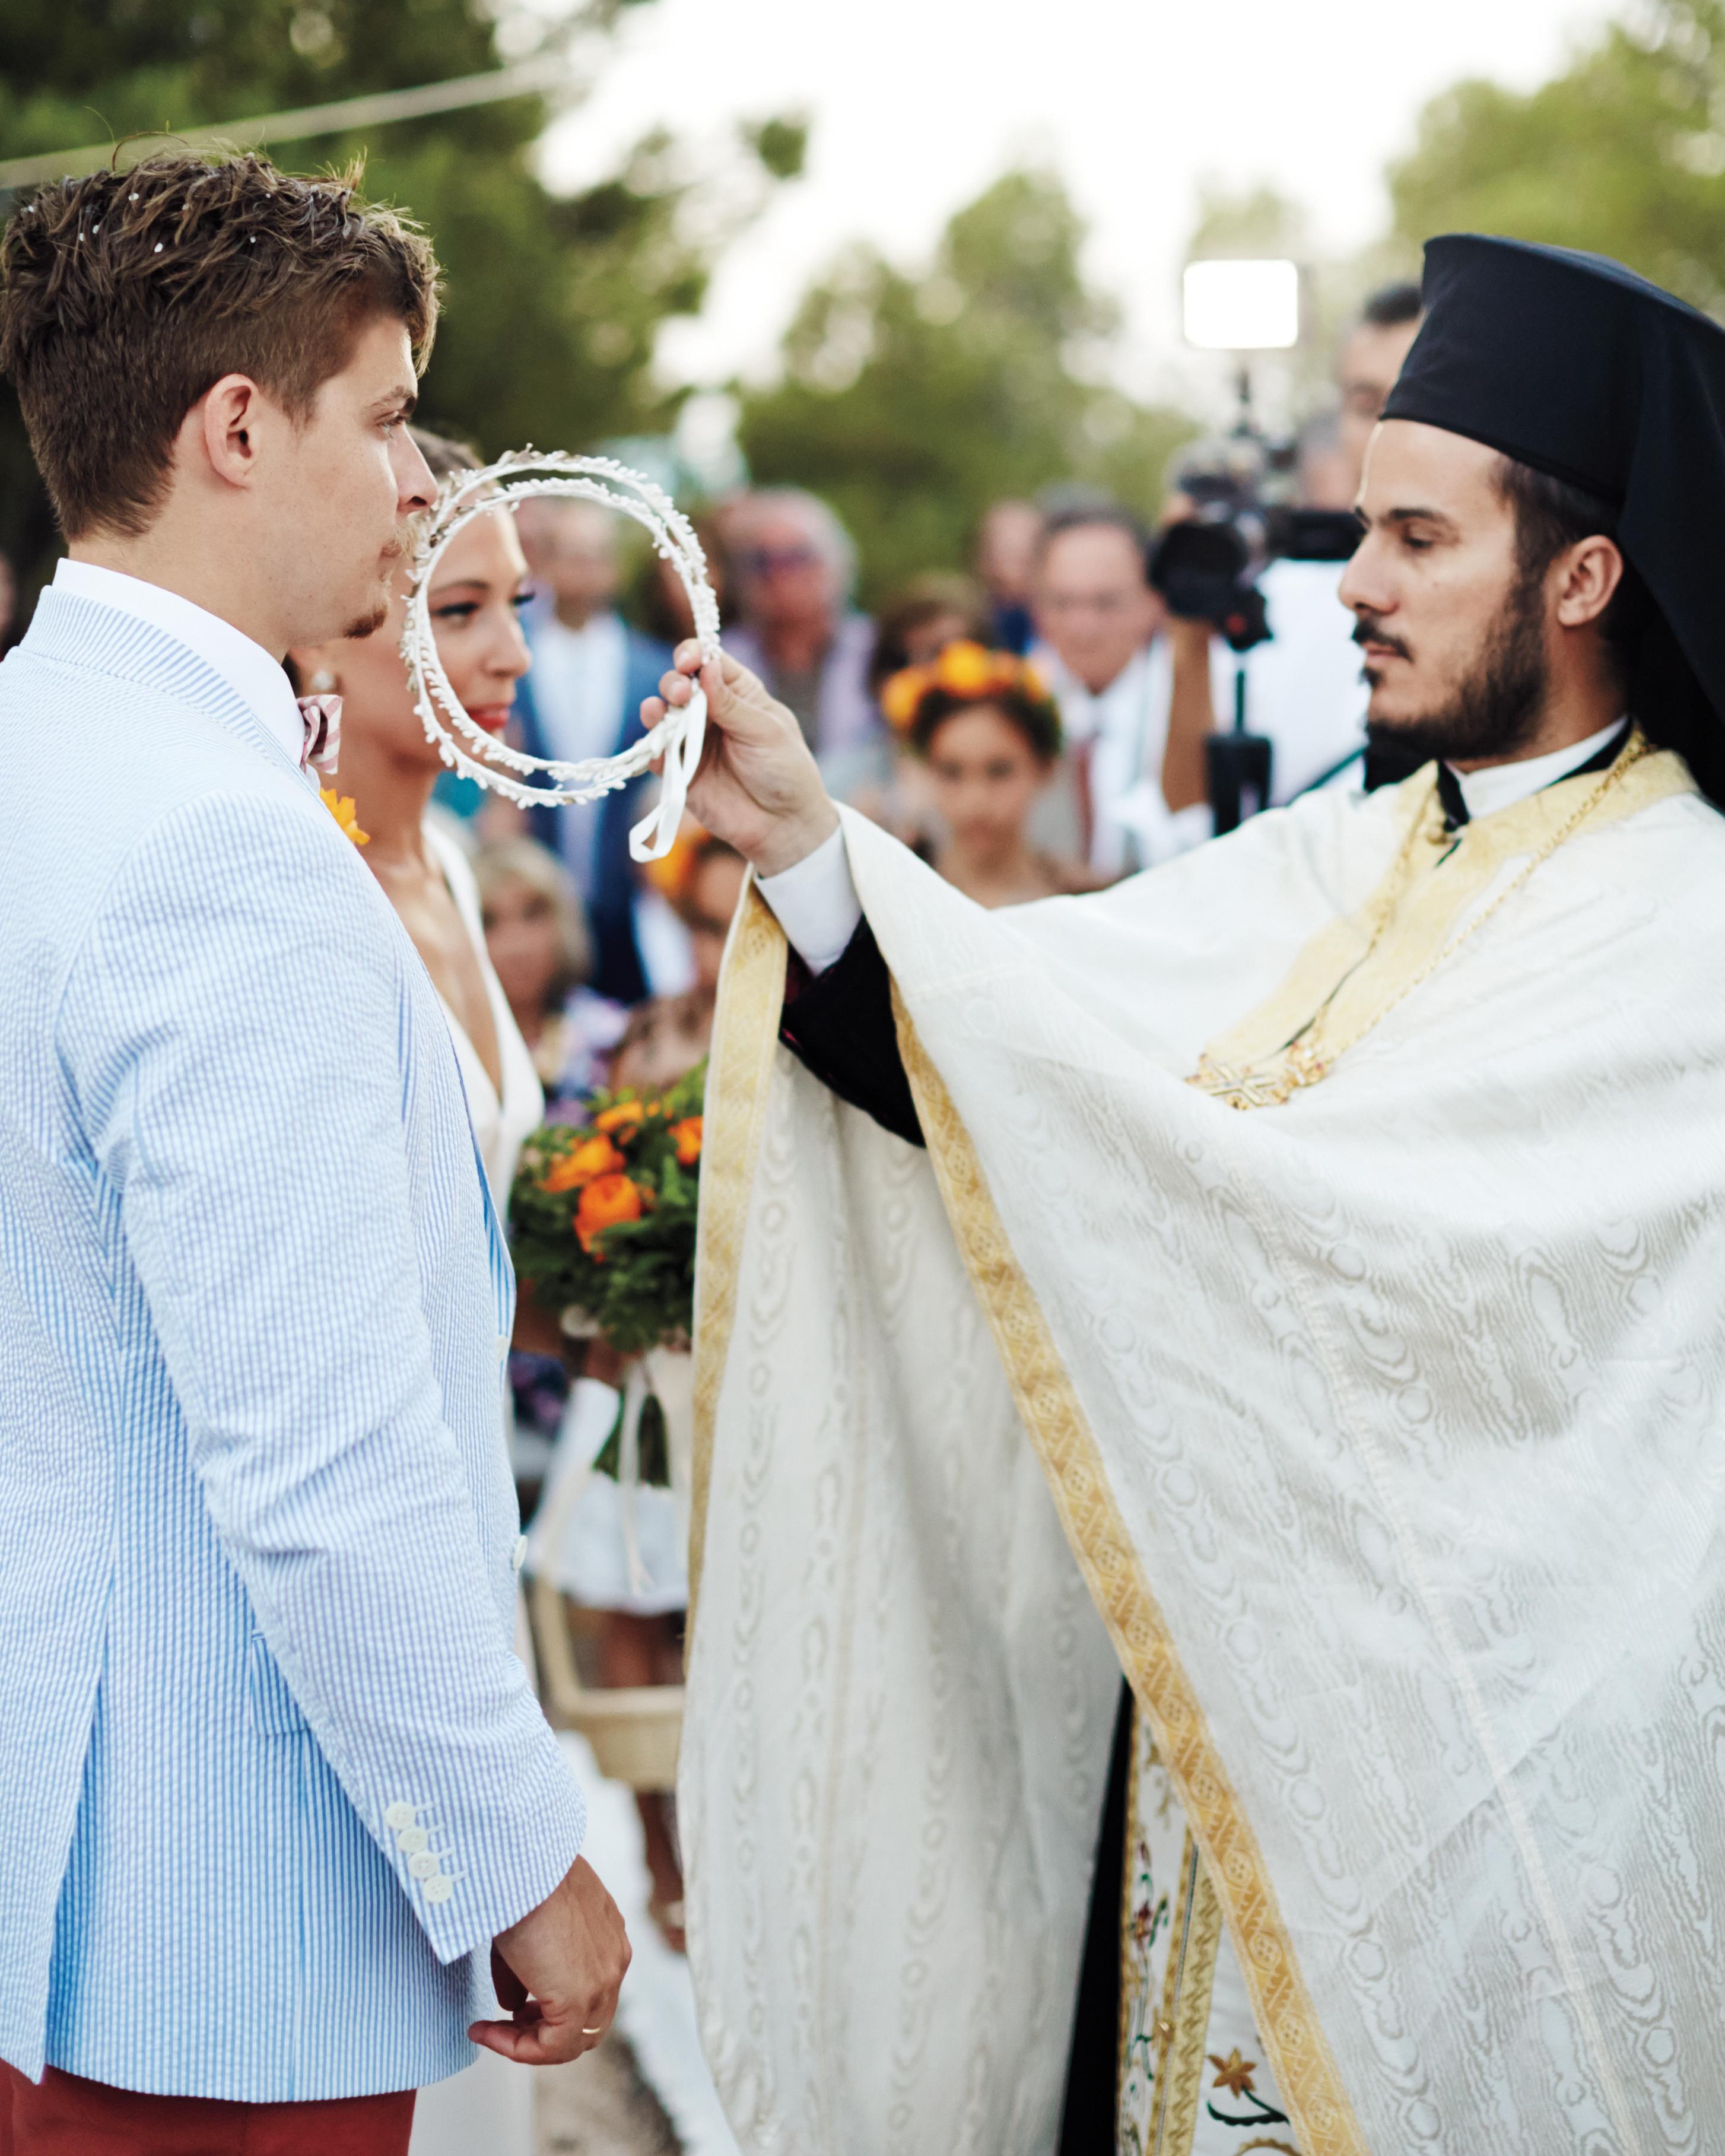 ana-alden-wedding-greece-611a4742-s111821.jpg